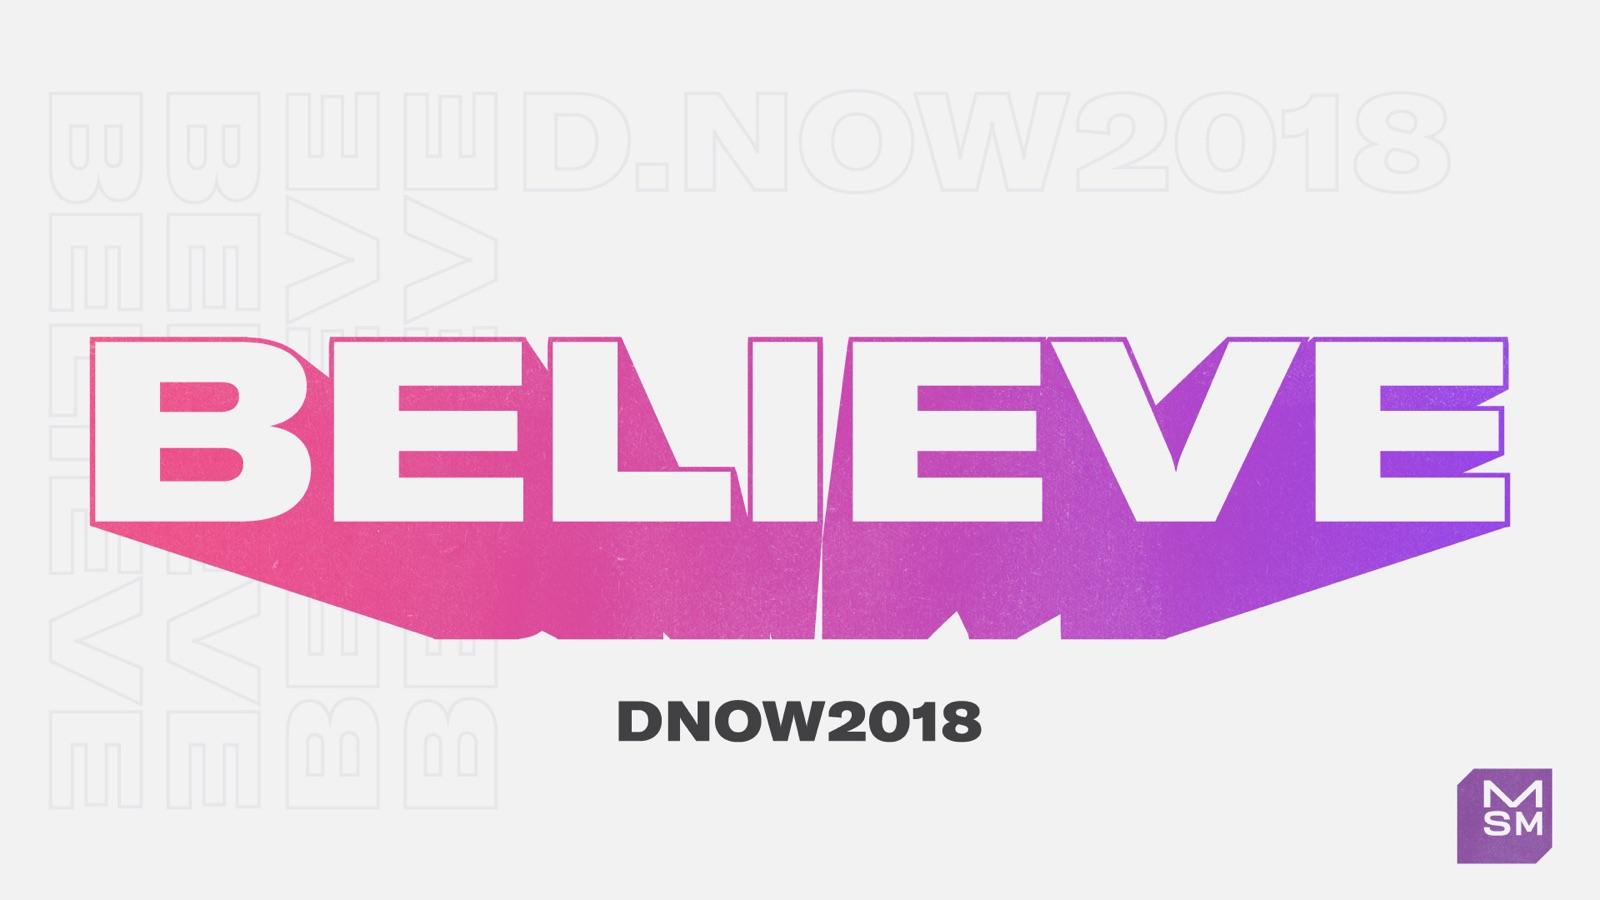 Believe slide 1920x1080.jpg